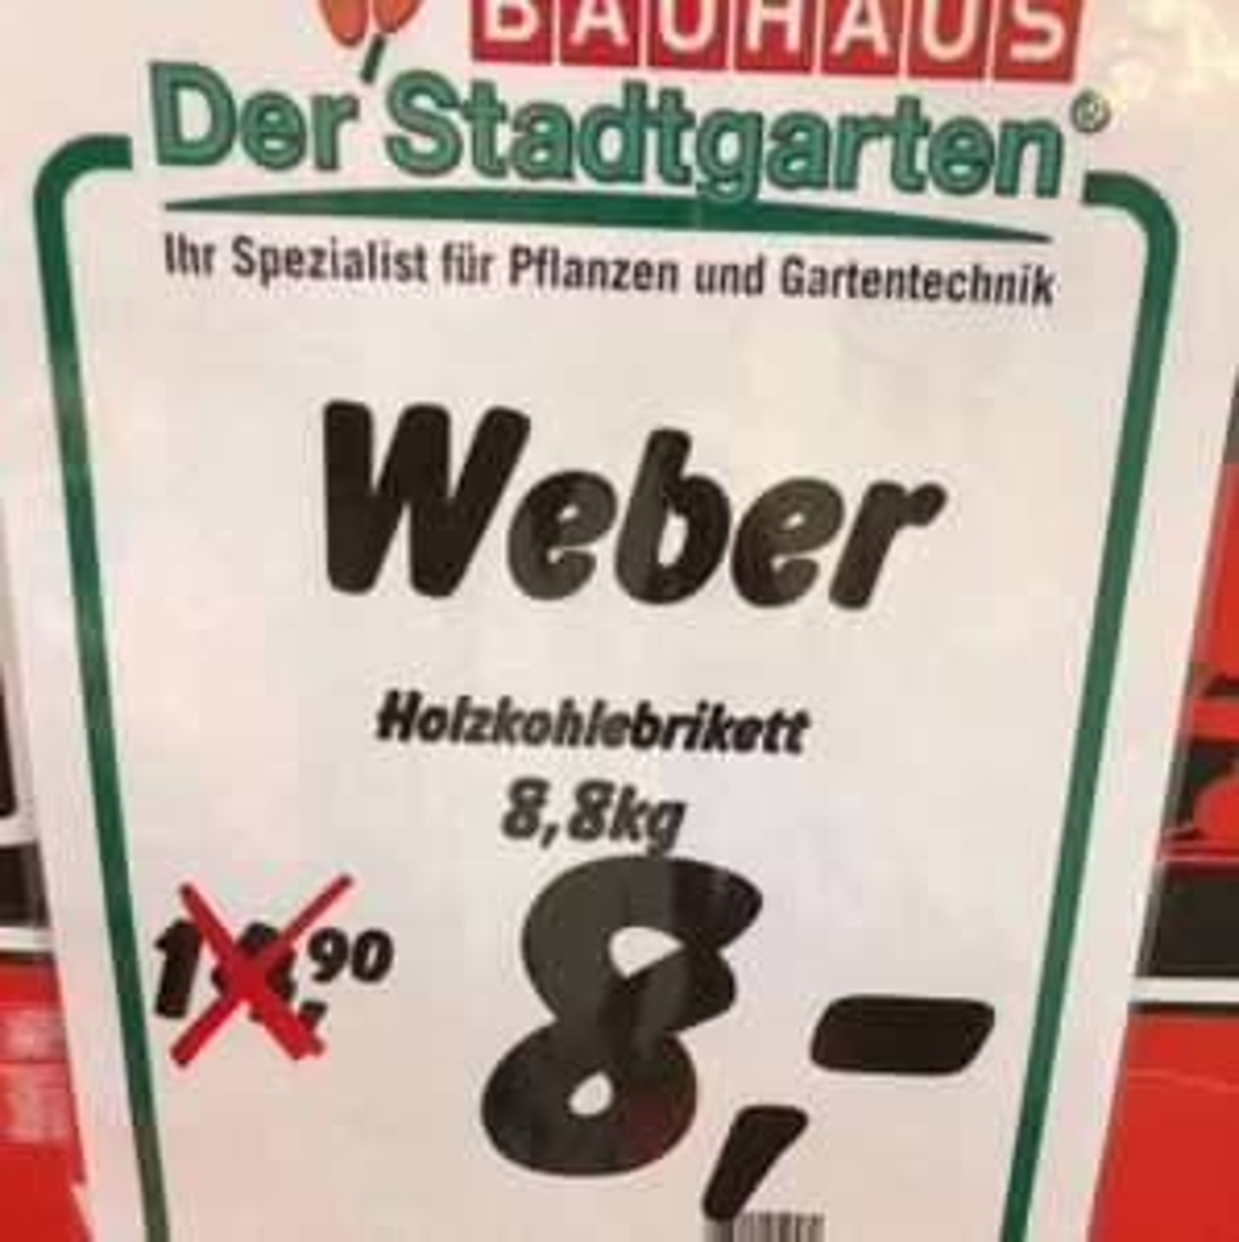 [Lokal Berlin Bauhaus] Weber Holzkohlebriketts 8,8 kg für 8€